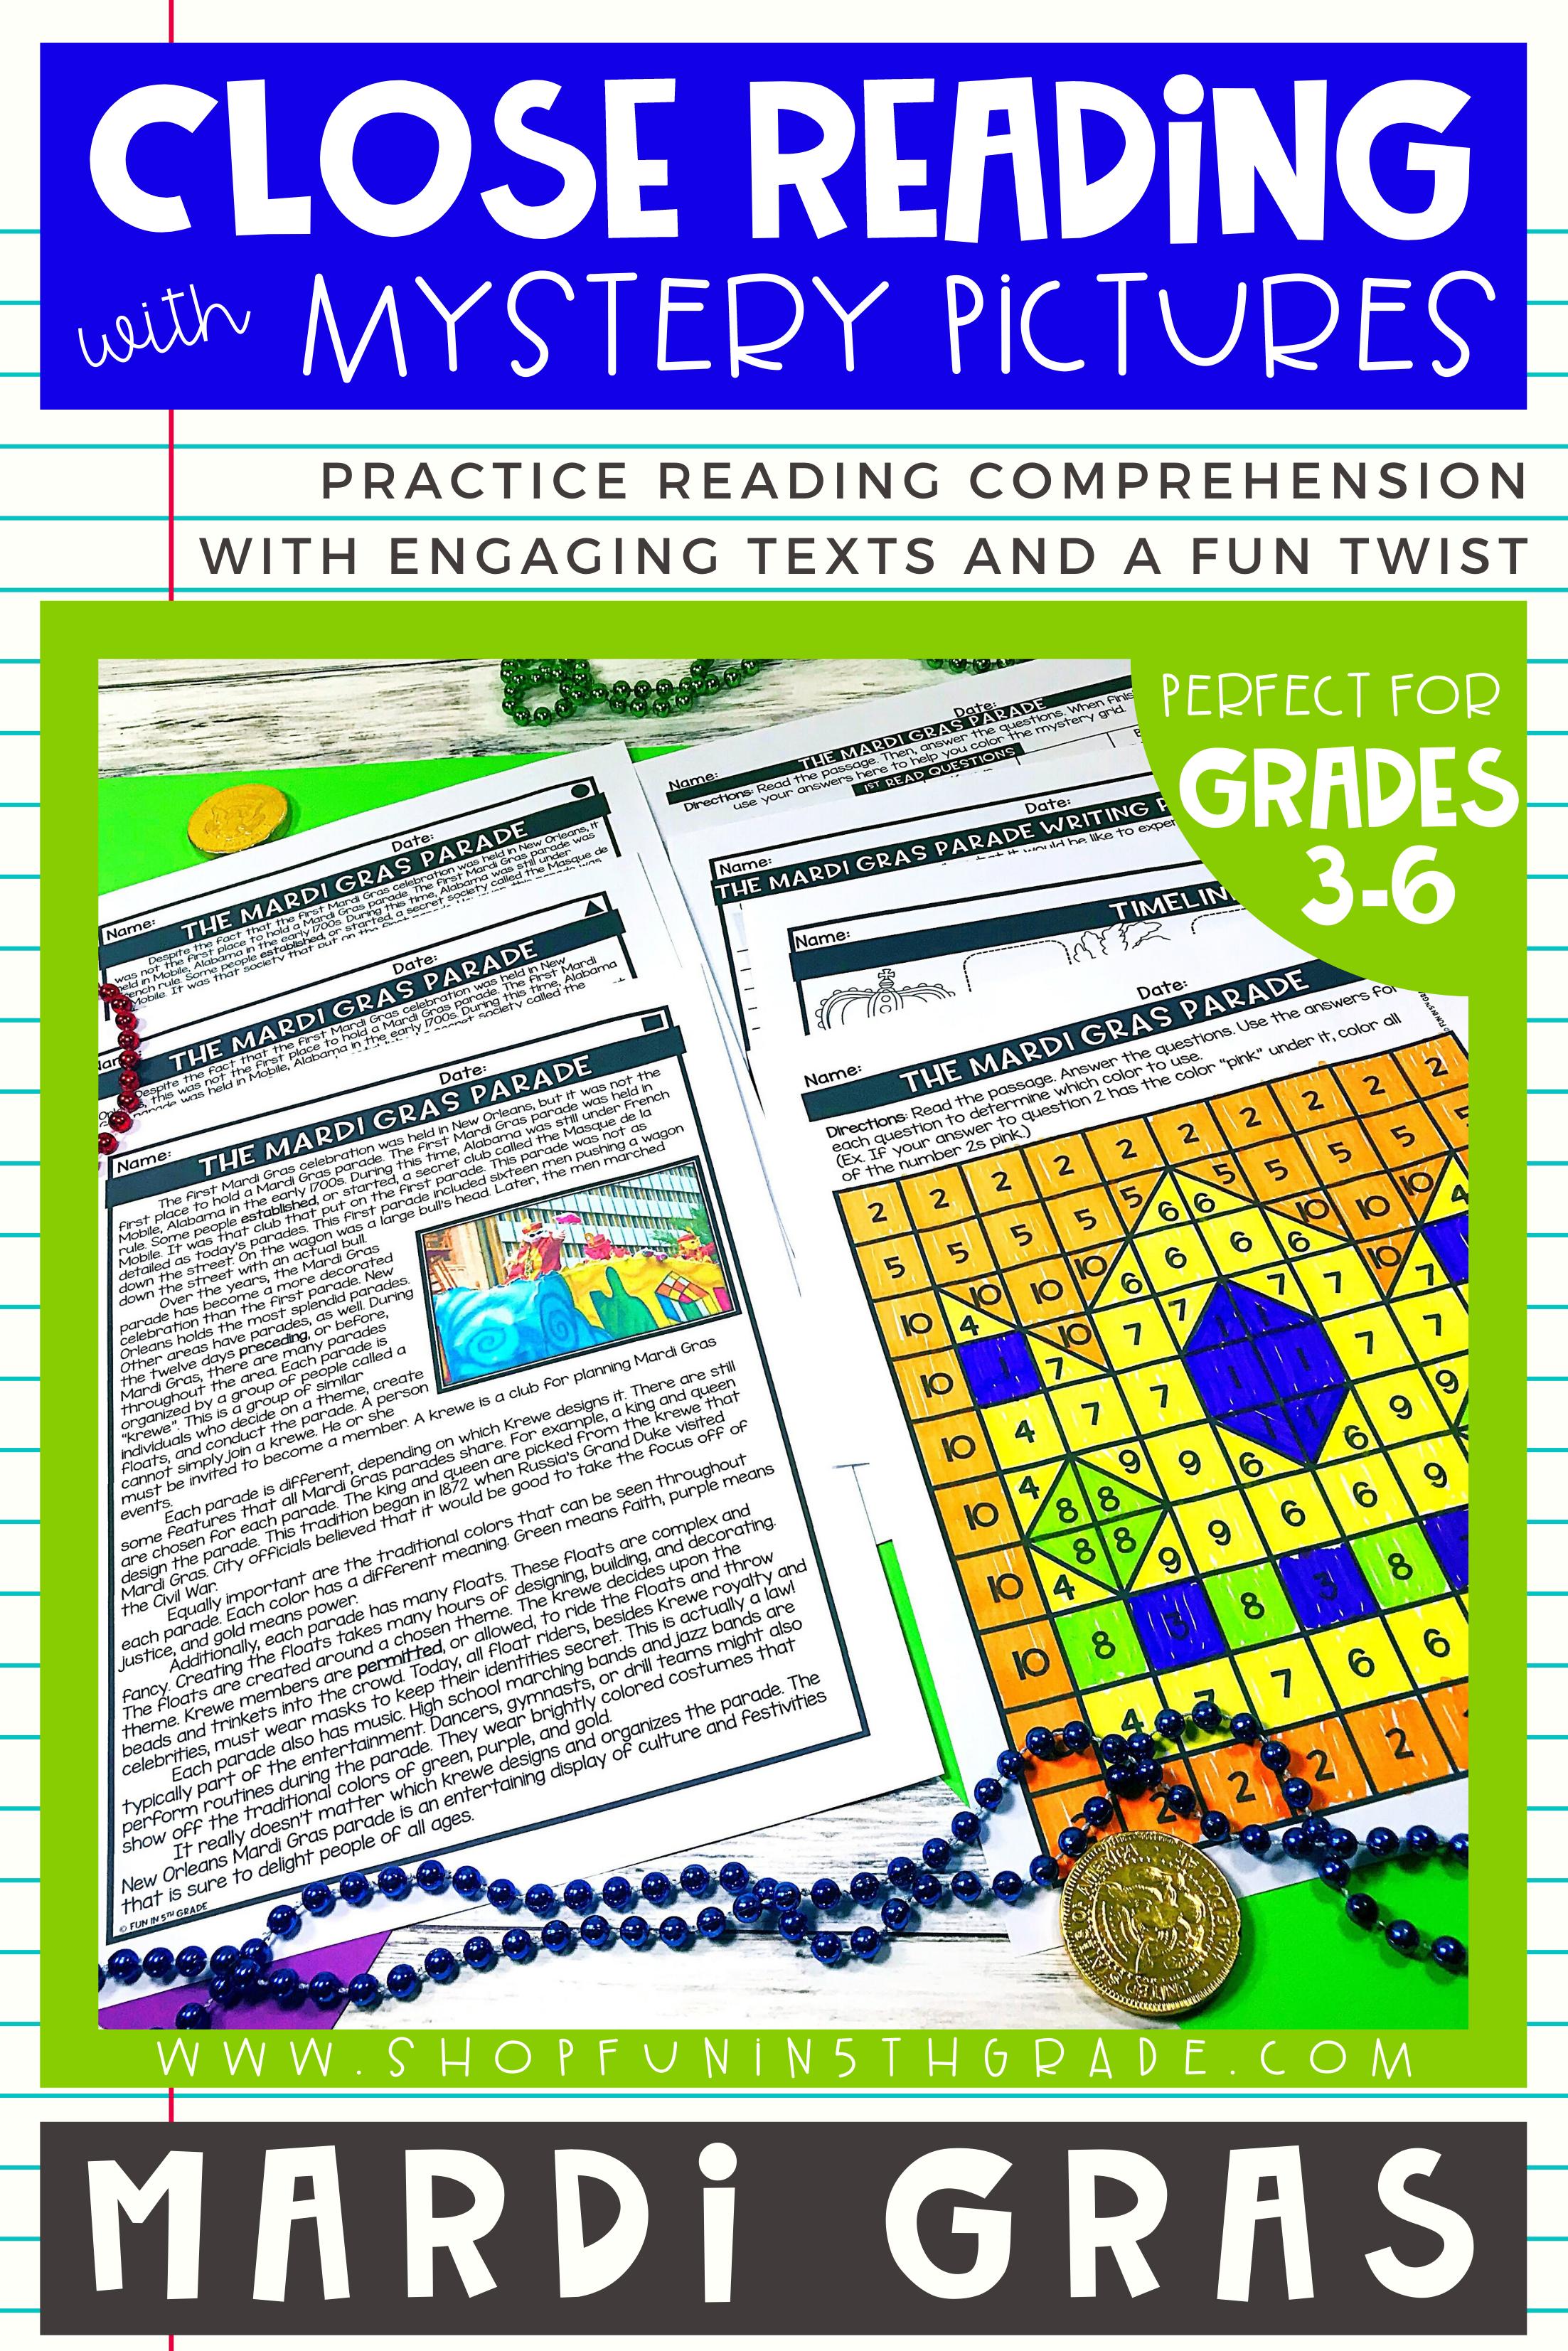 Mardi Gras Reading Comprehension Passages